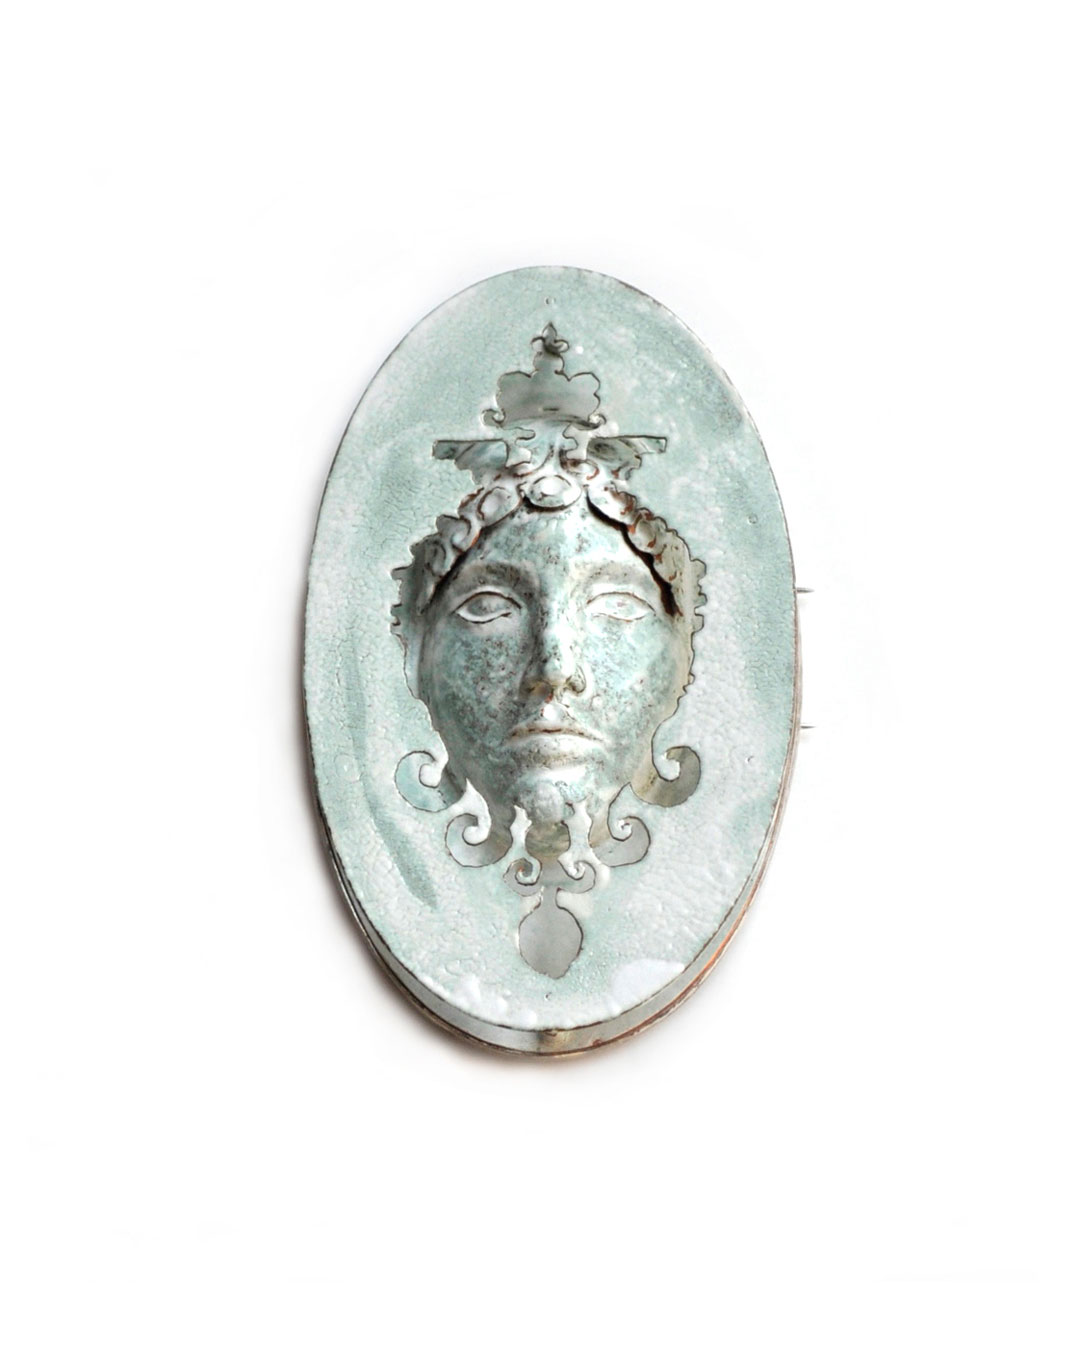 Vera Siemund, untitled, 2008, brooch; copper, silver, enamel, 55 x 95 x 15 mm, €1940